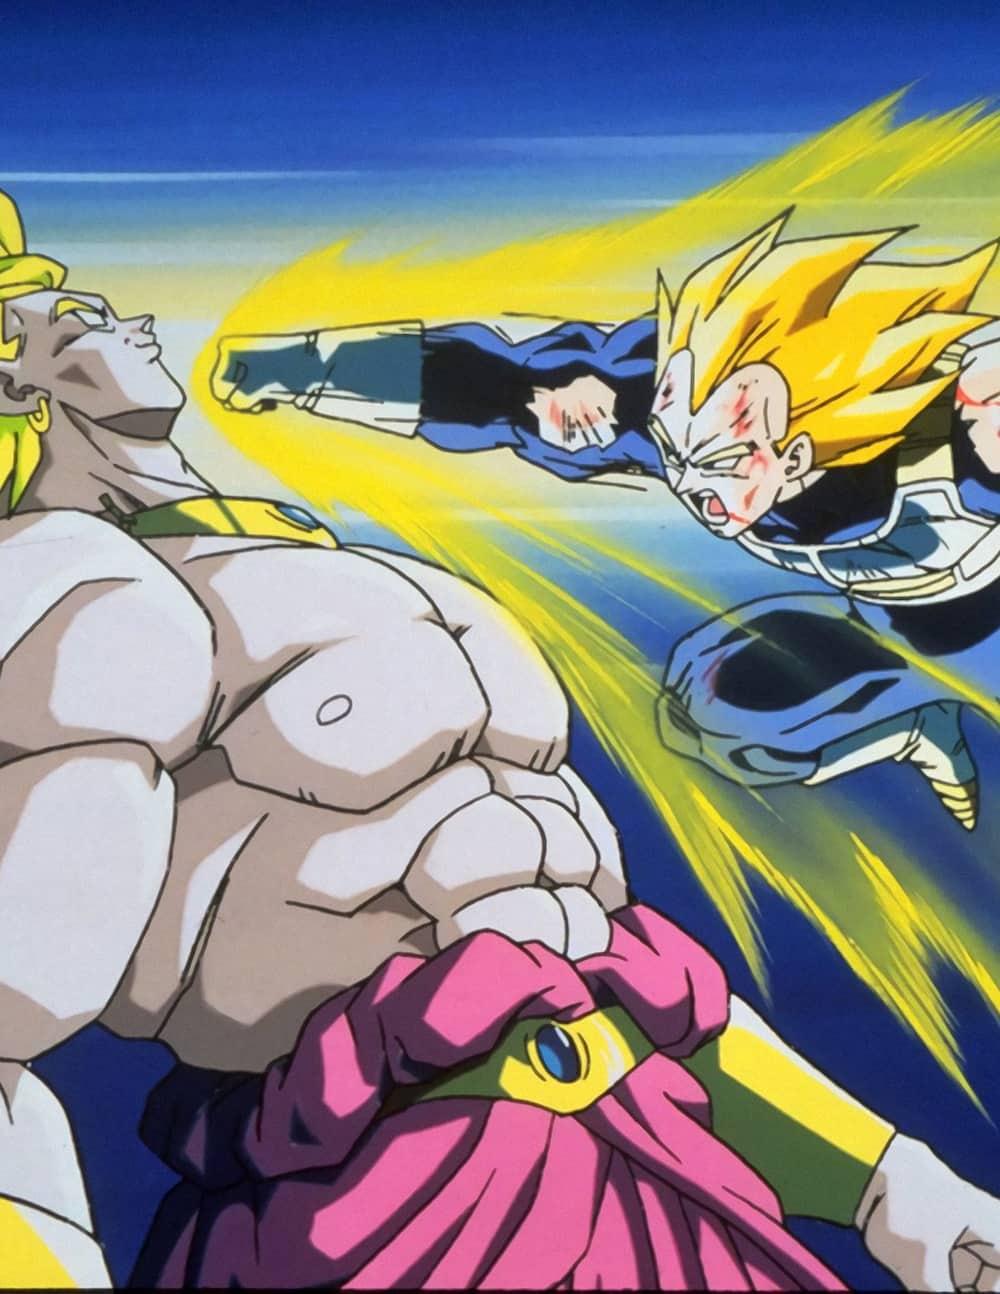 When does Goku go Super Saiyan